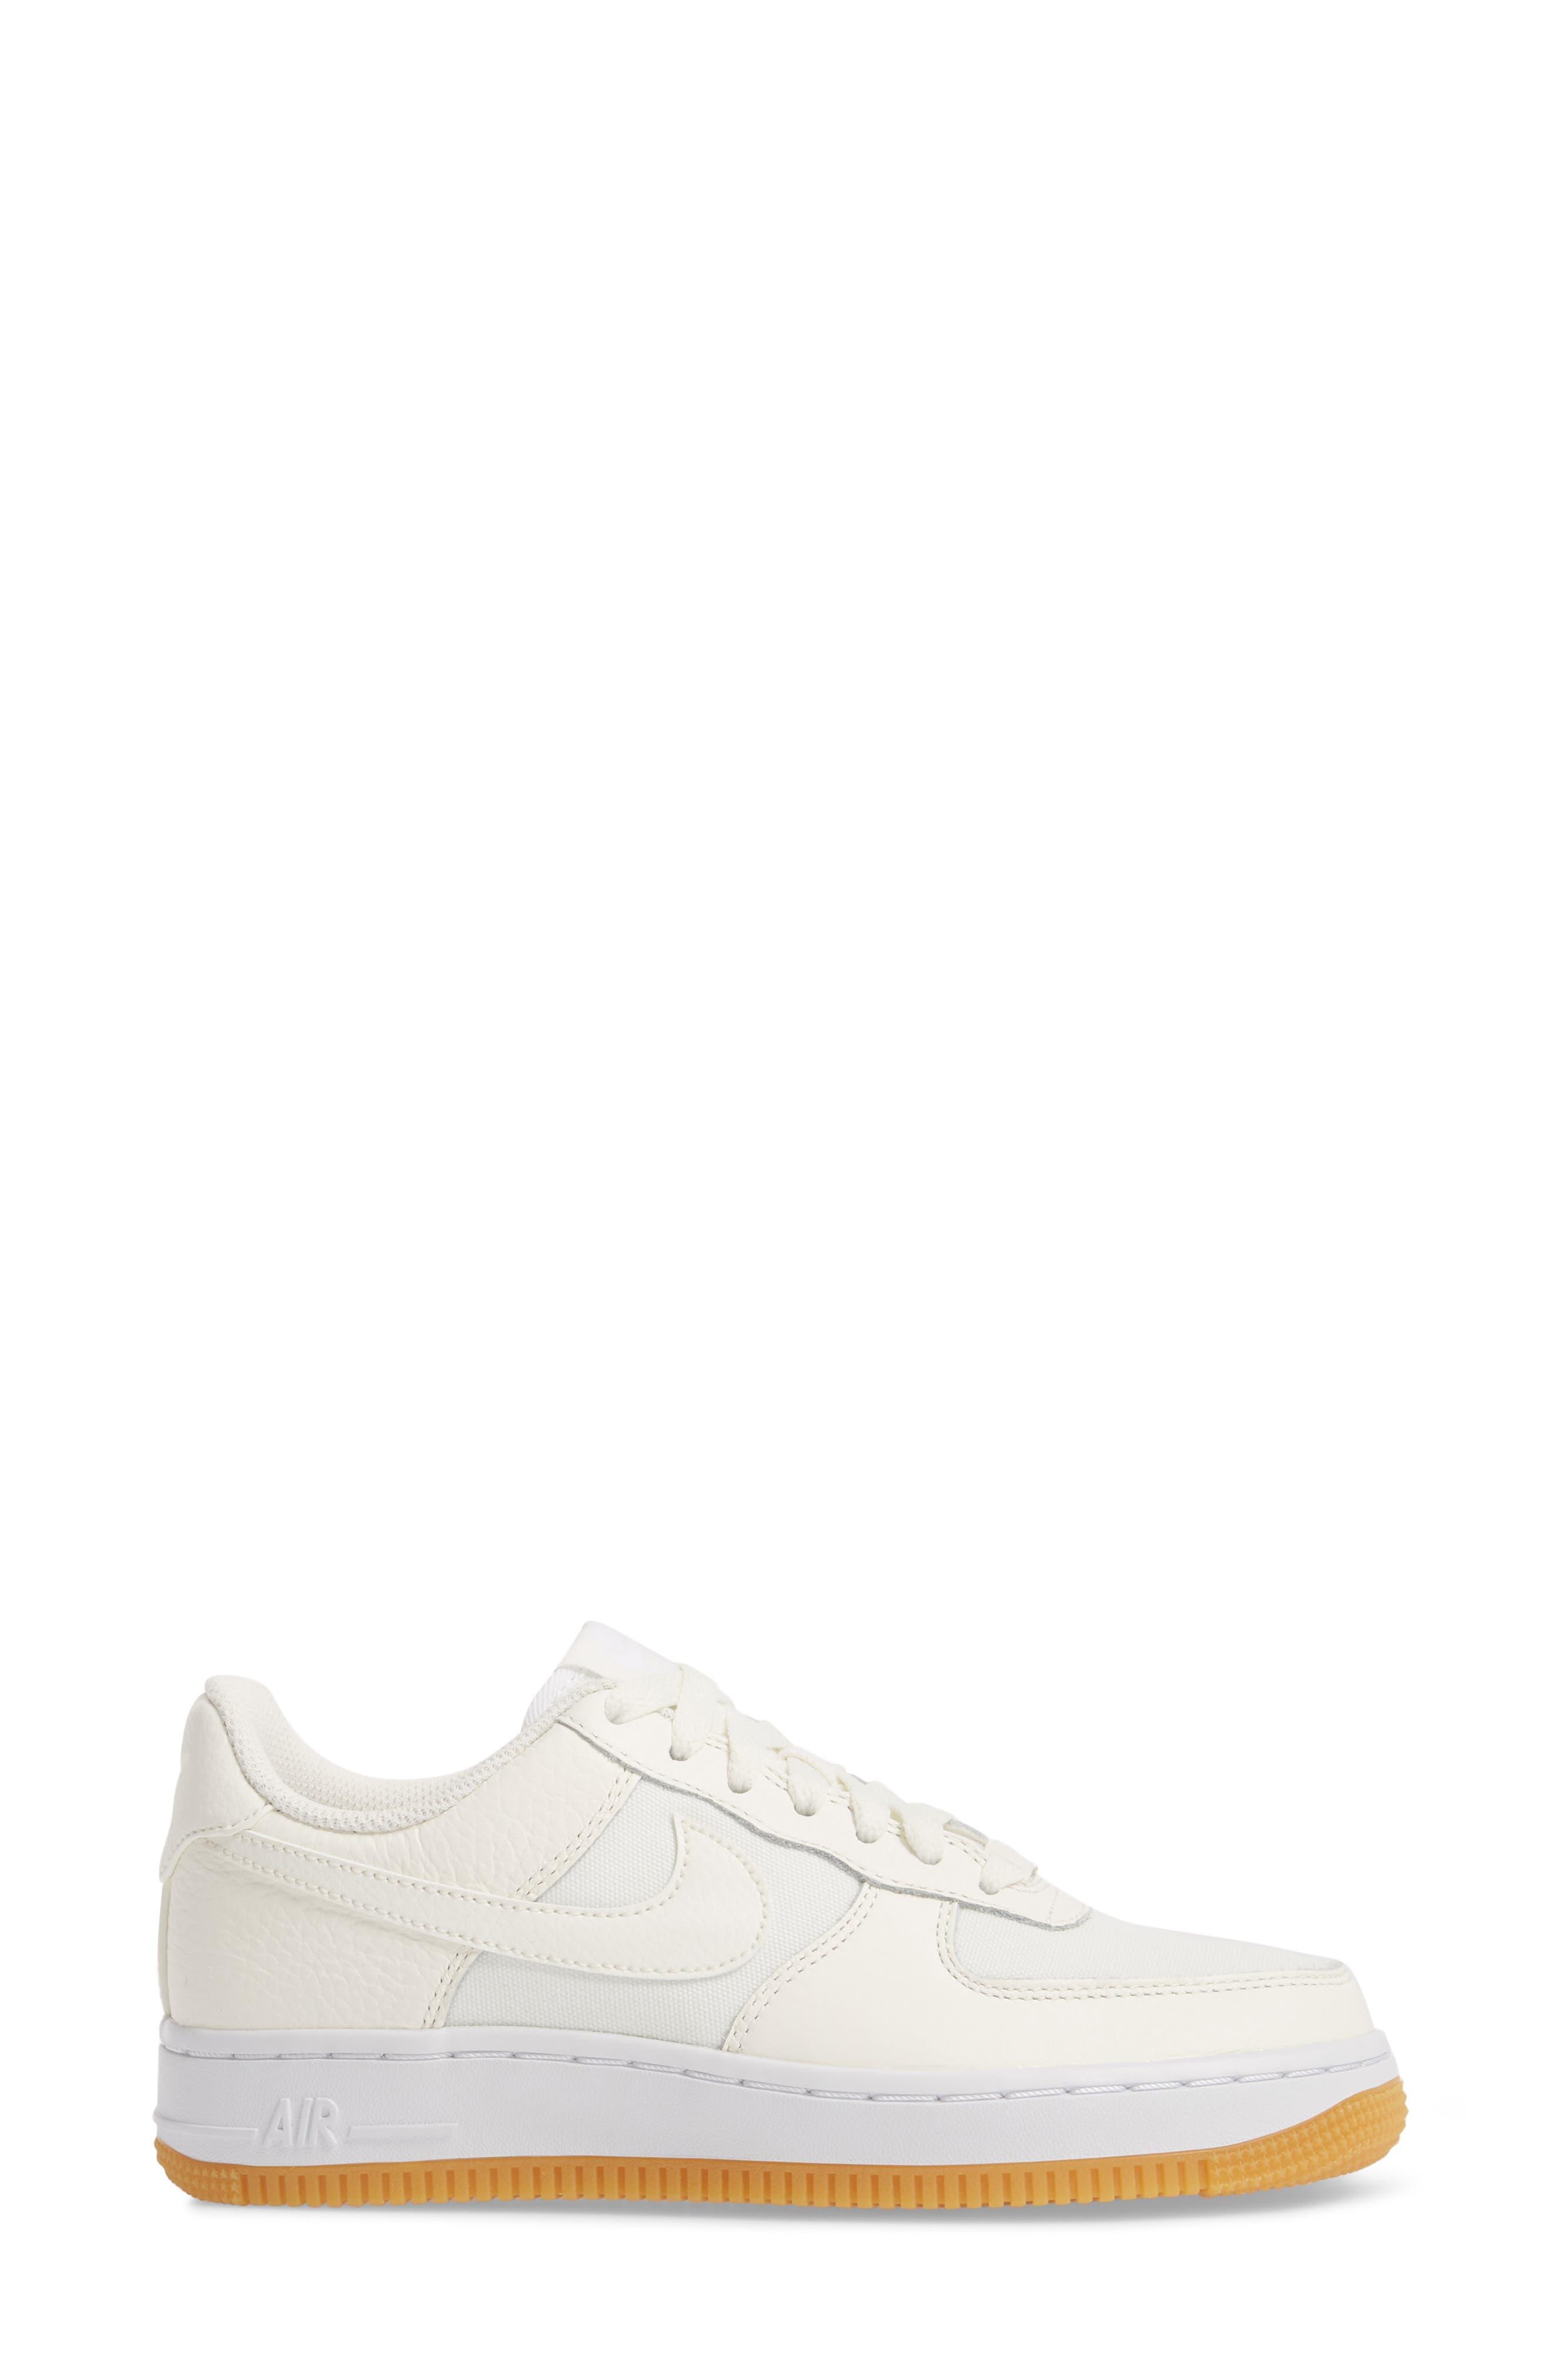 Air Force 1 '07 Premium Sneaker,                             Alternate thumbnail 3, color,                             Sail/ White/ Light Brown